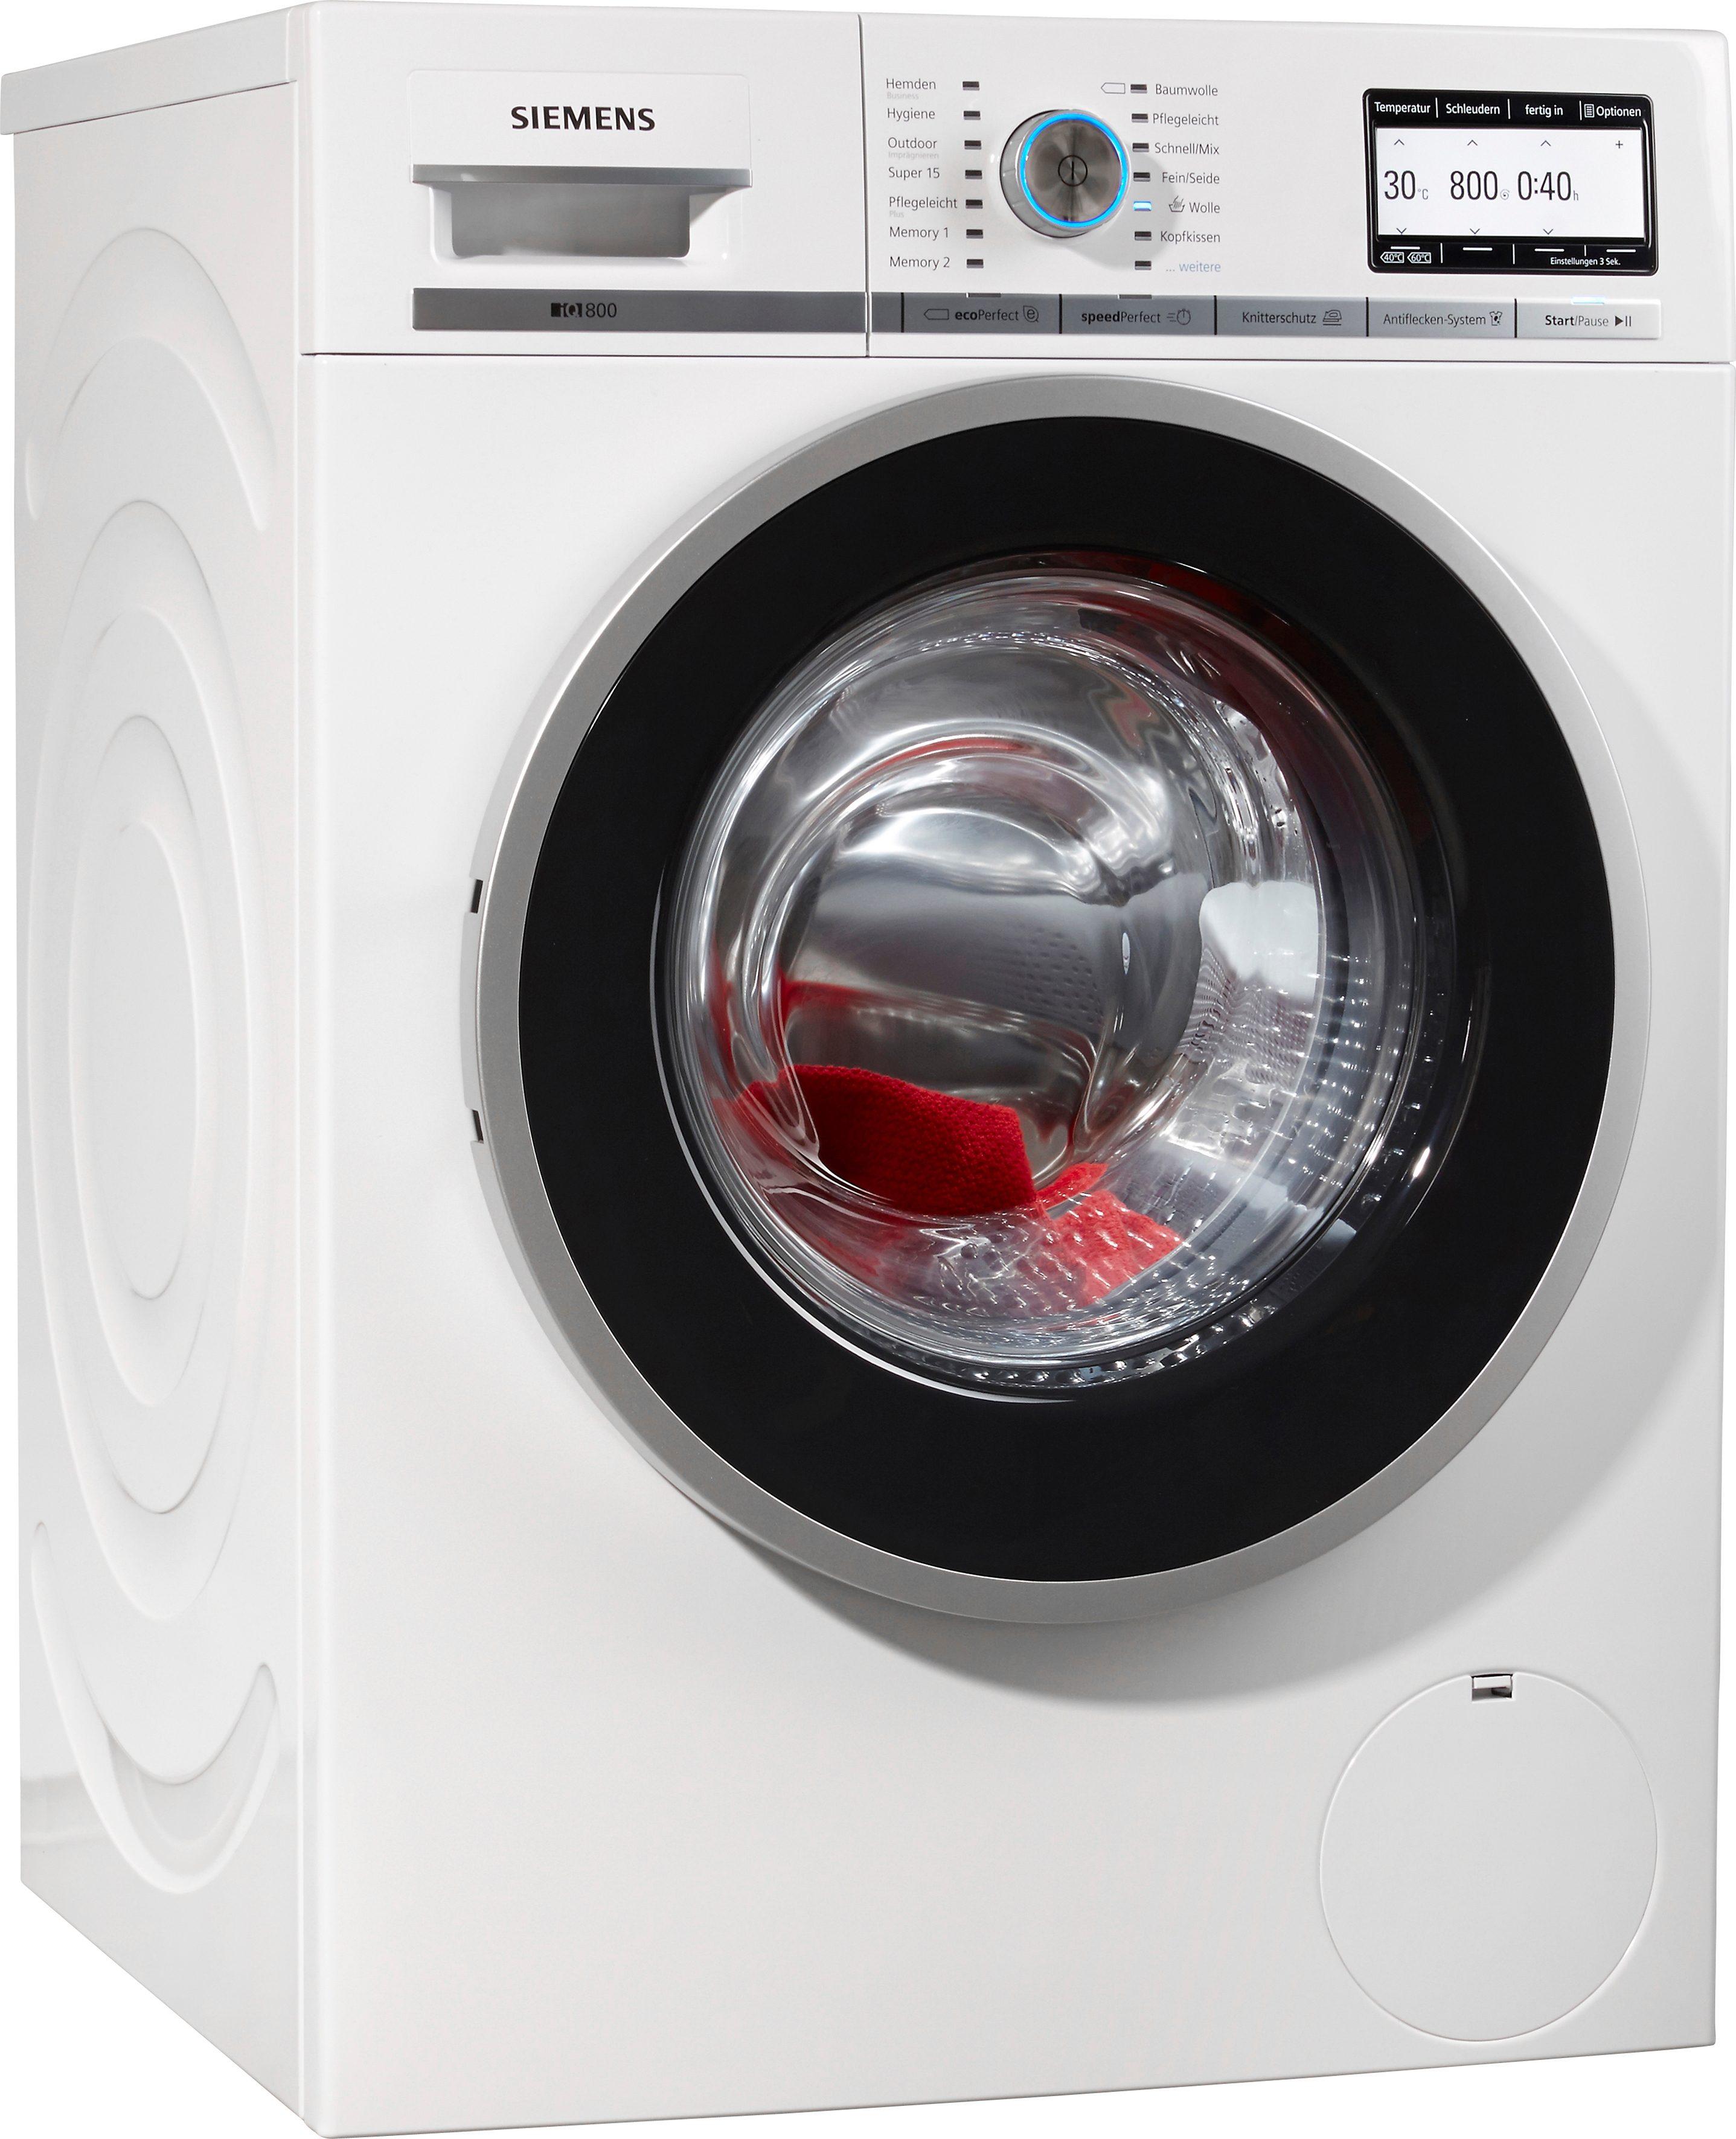 SIEMENS Waschmaschine WM14Y74D, A+++, 8 kg, 1400 U/Min